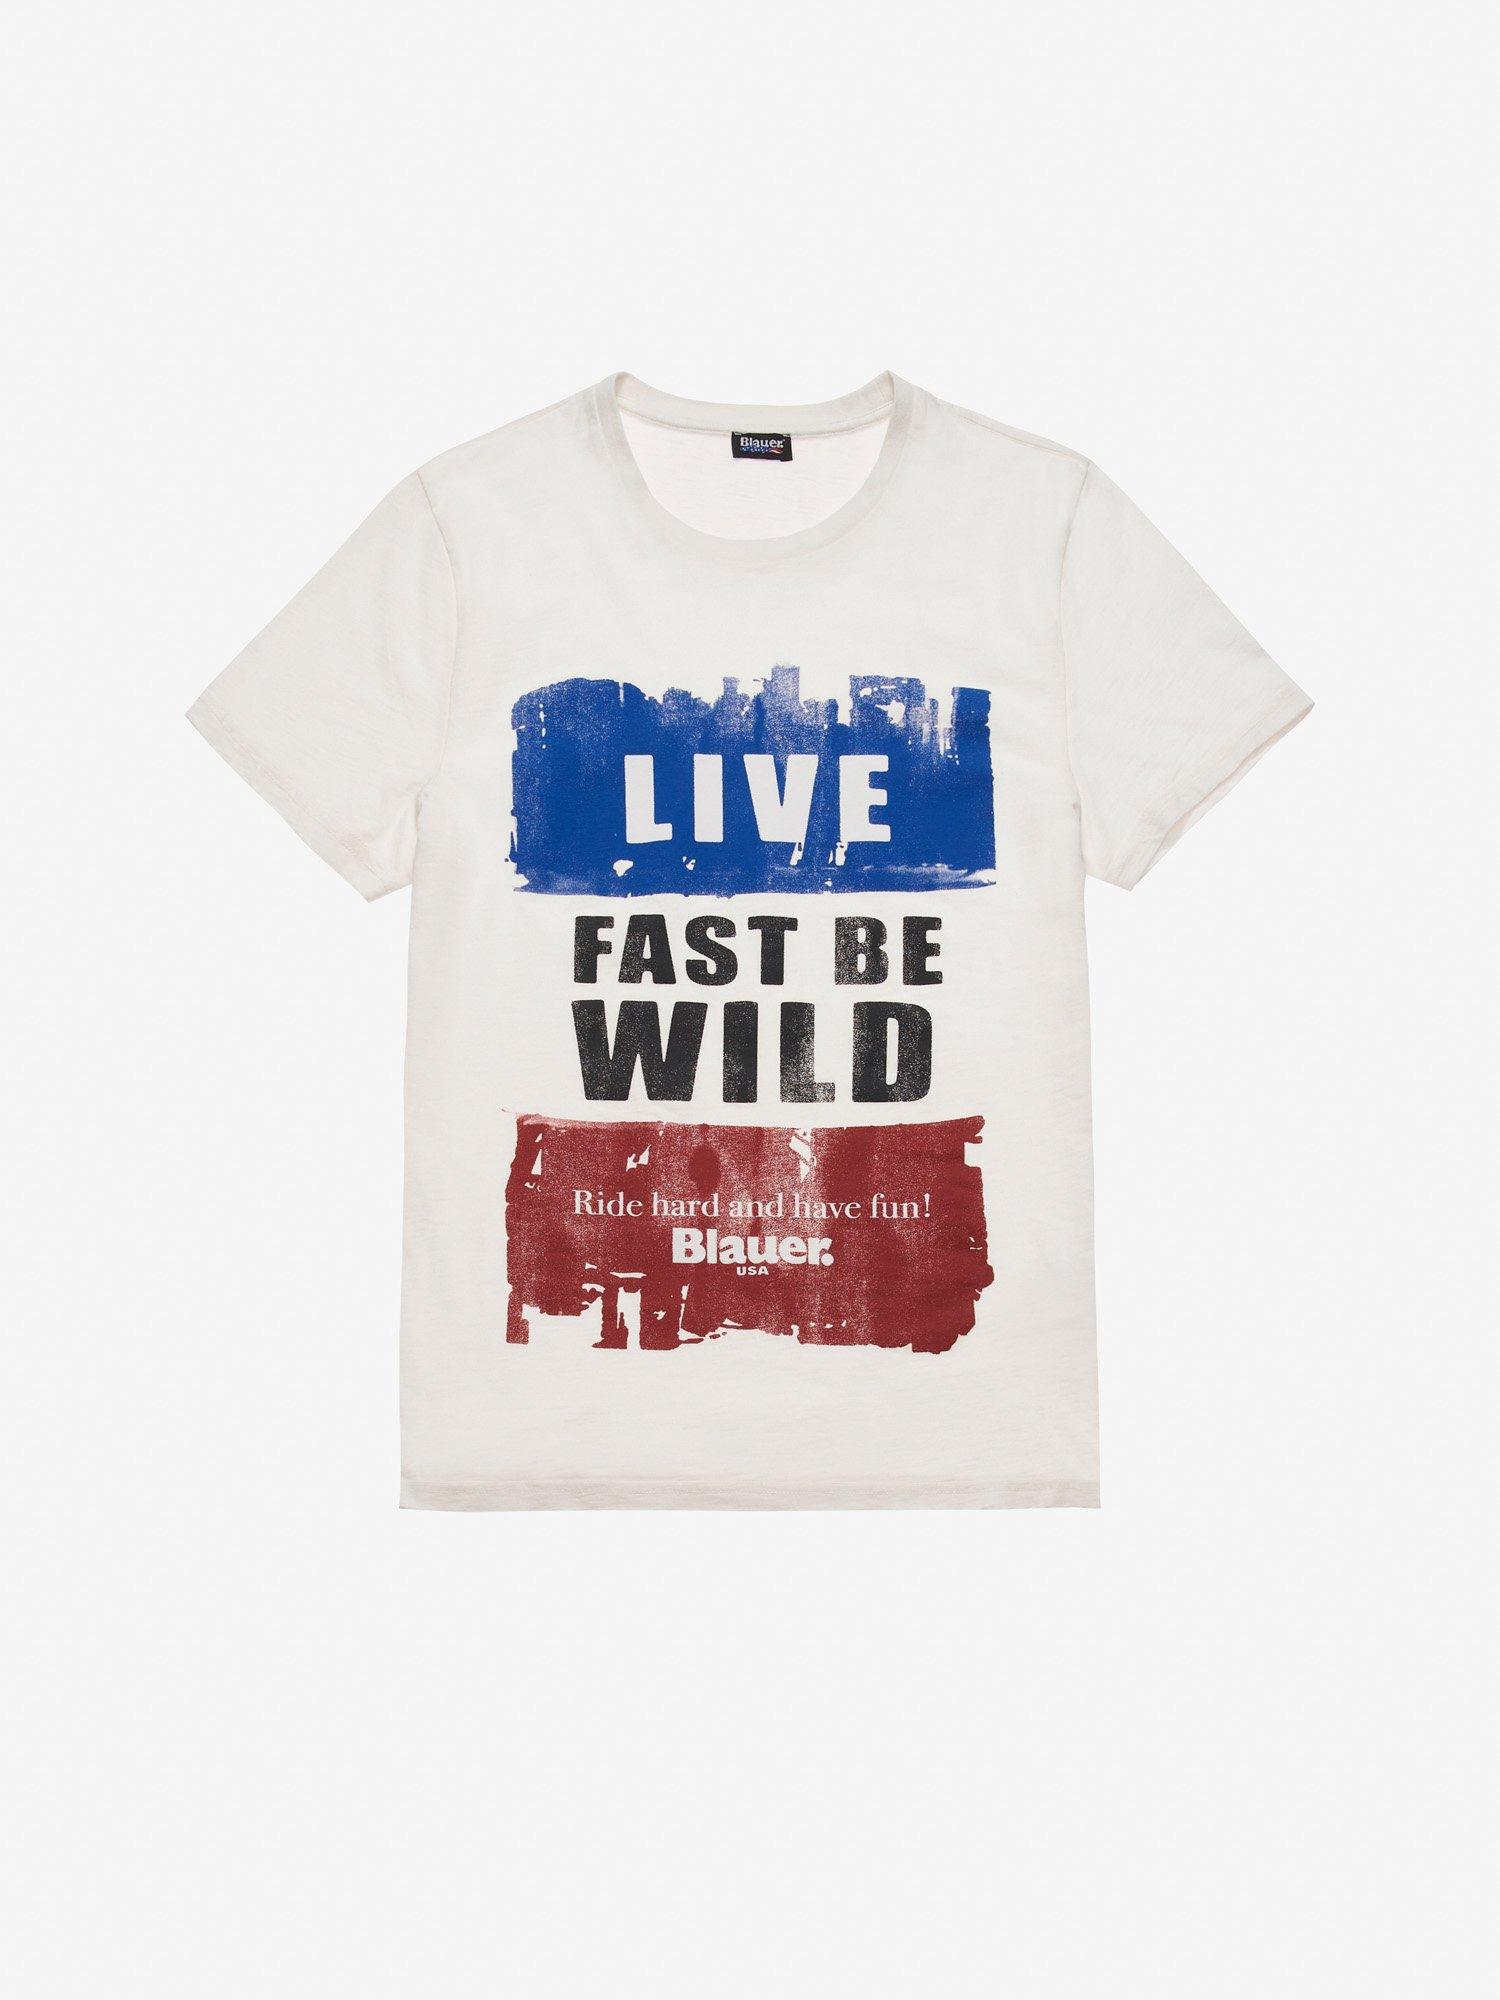 LIVE FAST BE WILD T-SHIRT - Blauer